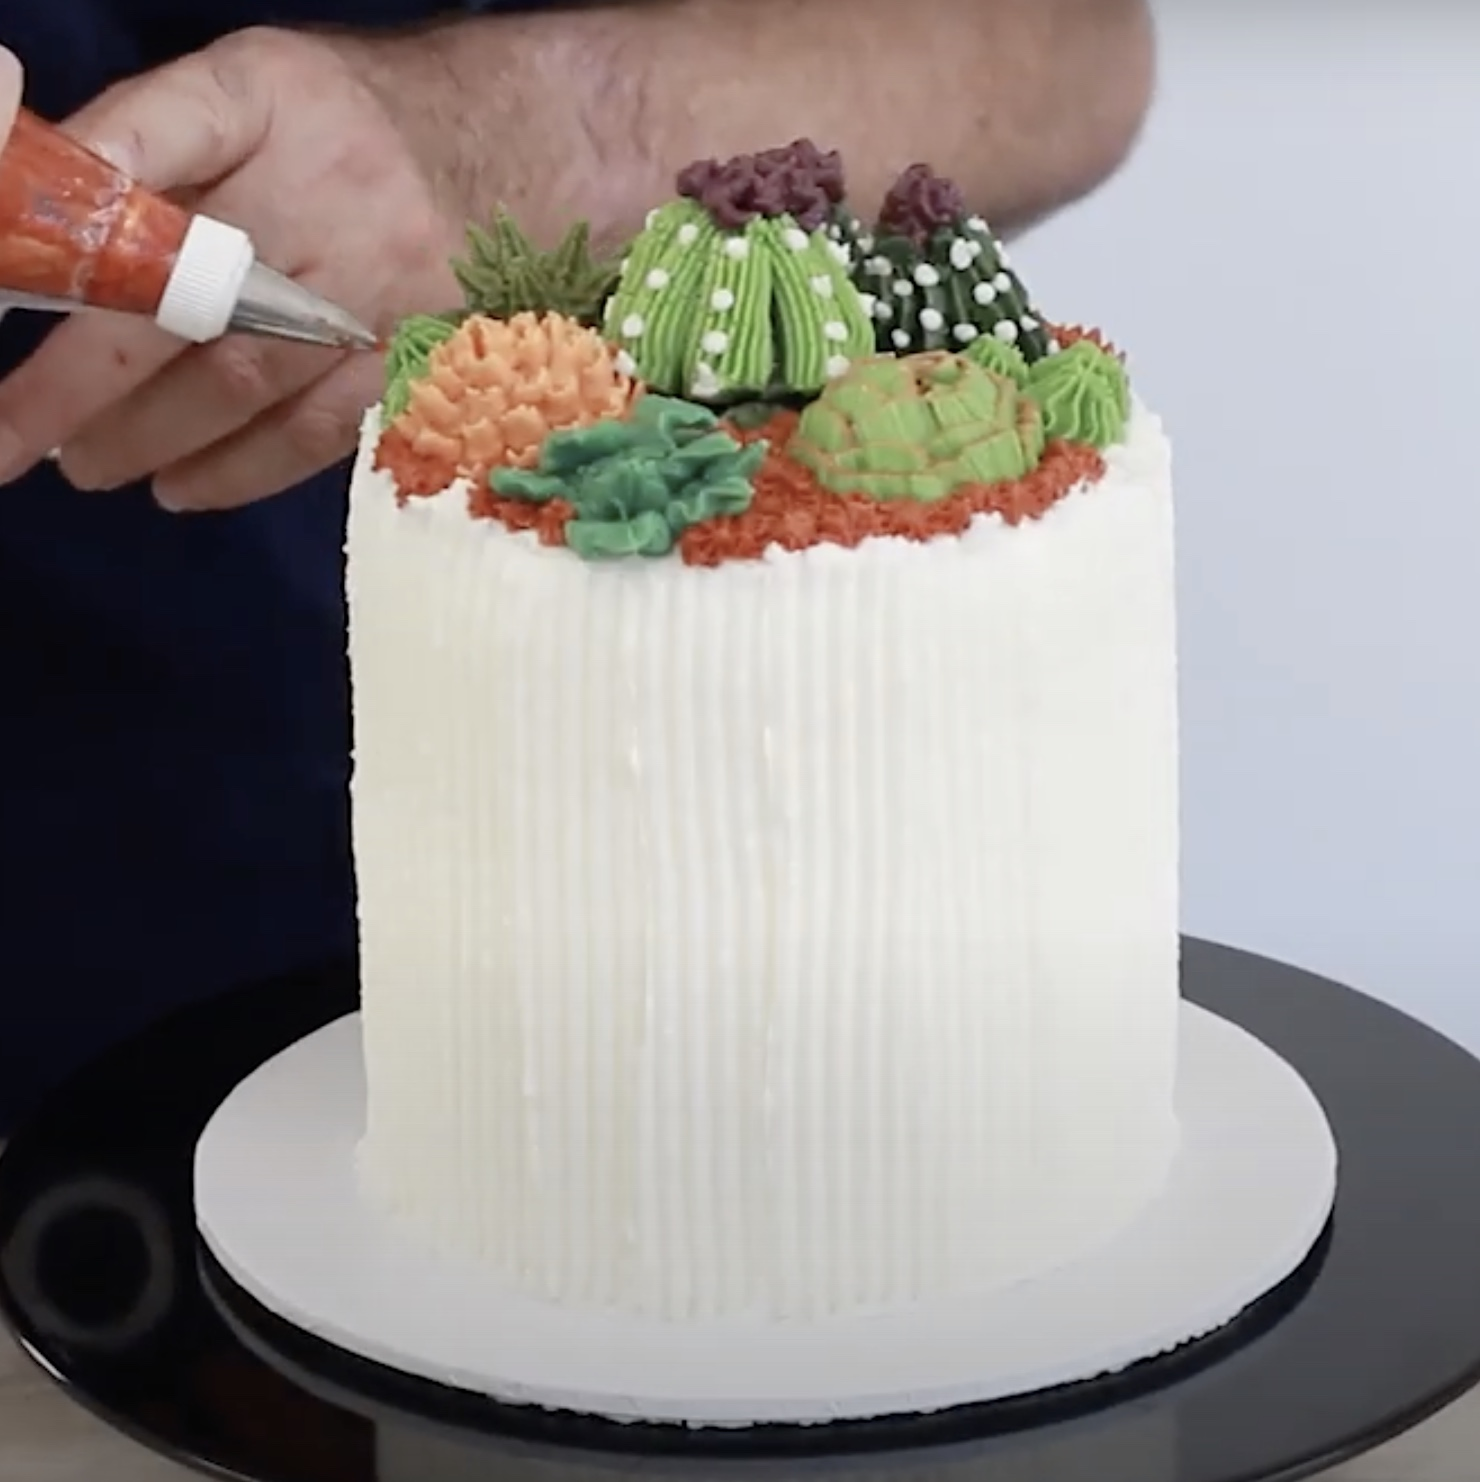 How to create a Buttercream Succulent Cake